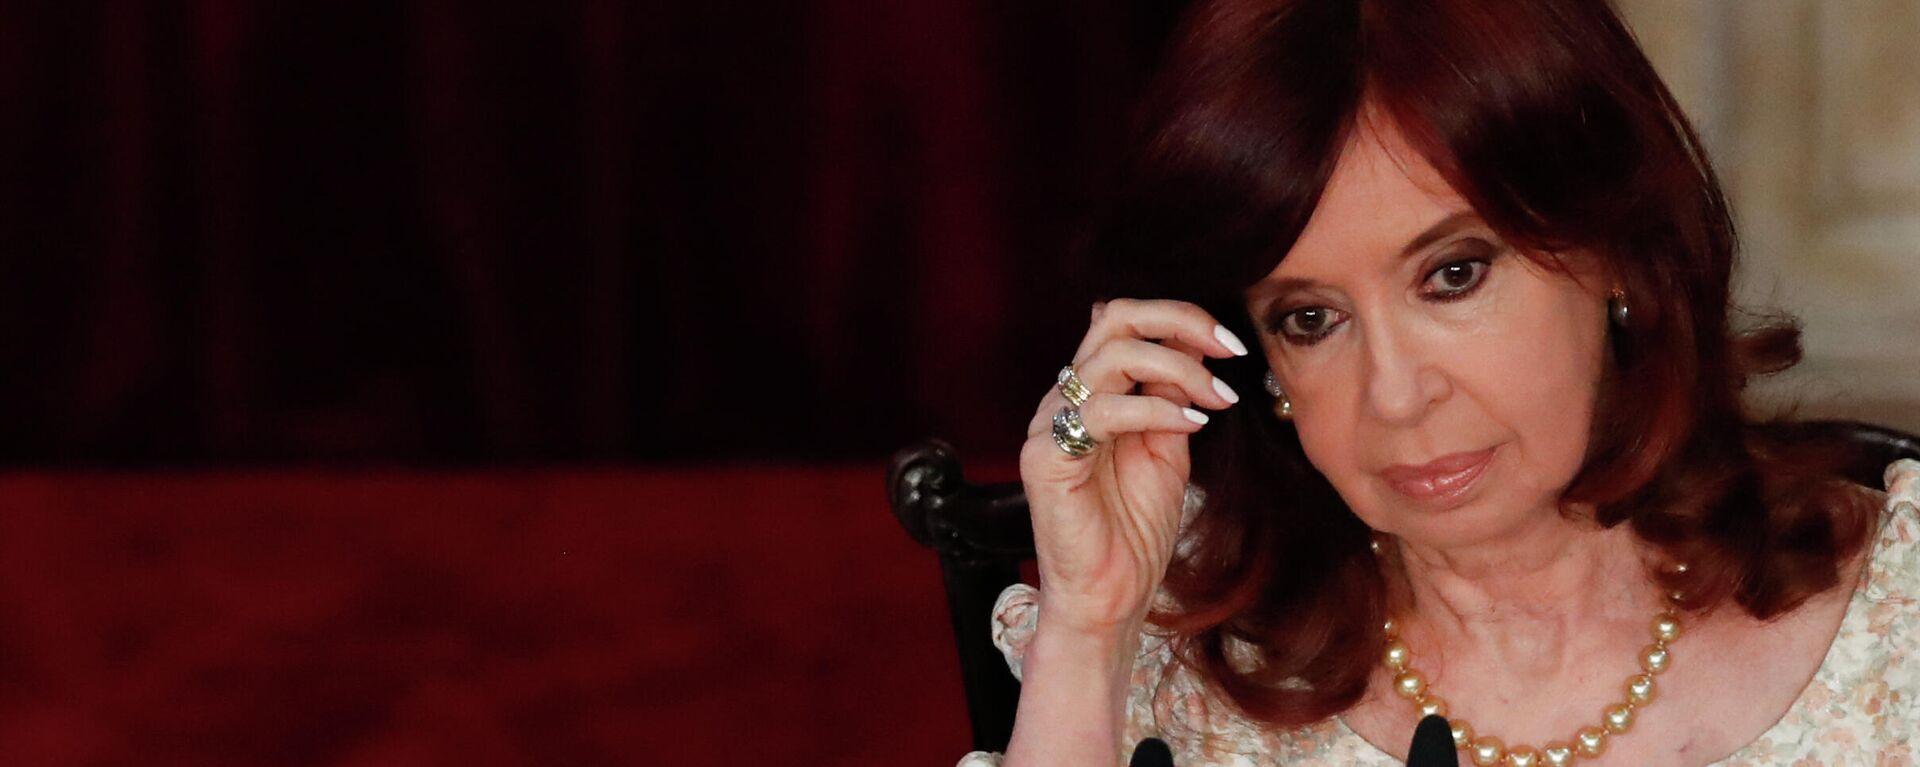 Cristina Fernández de Kirchner, vicepresidenta argentina - Sputnik Mundo, 1920, 14.06.2021